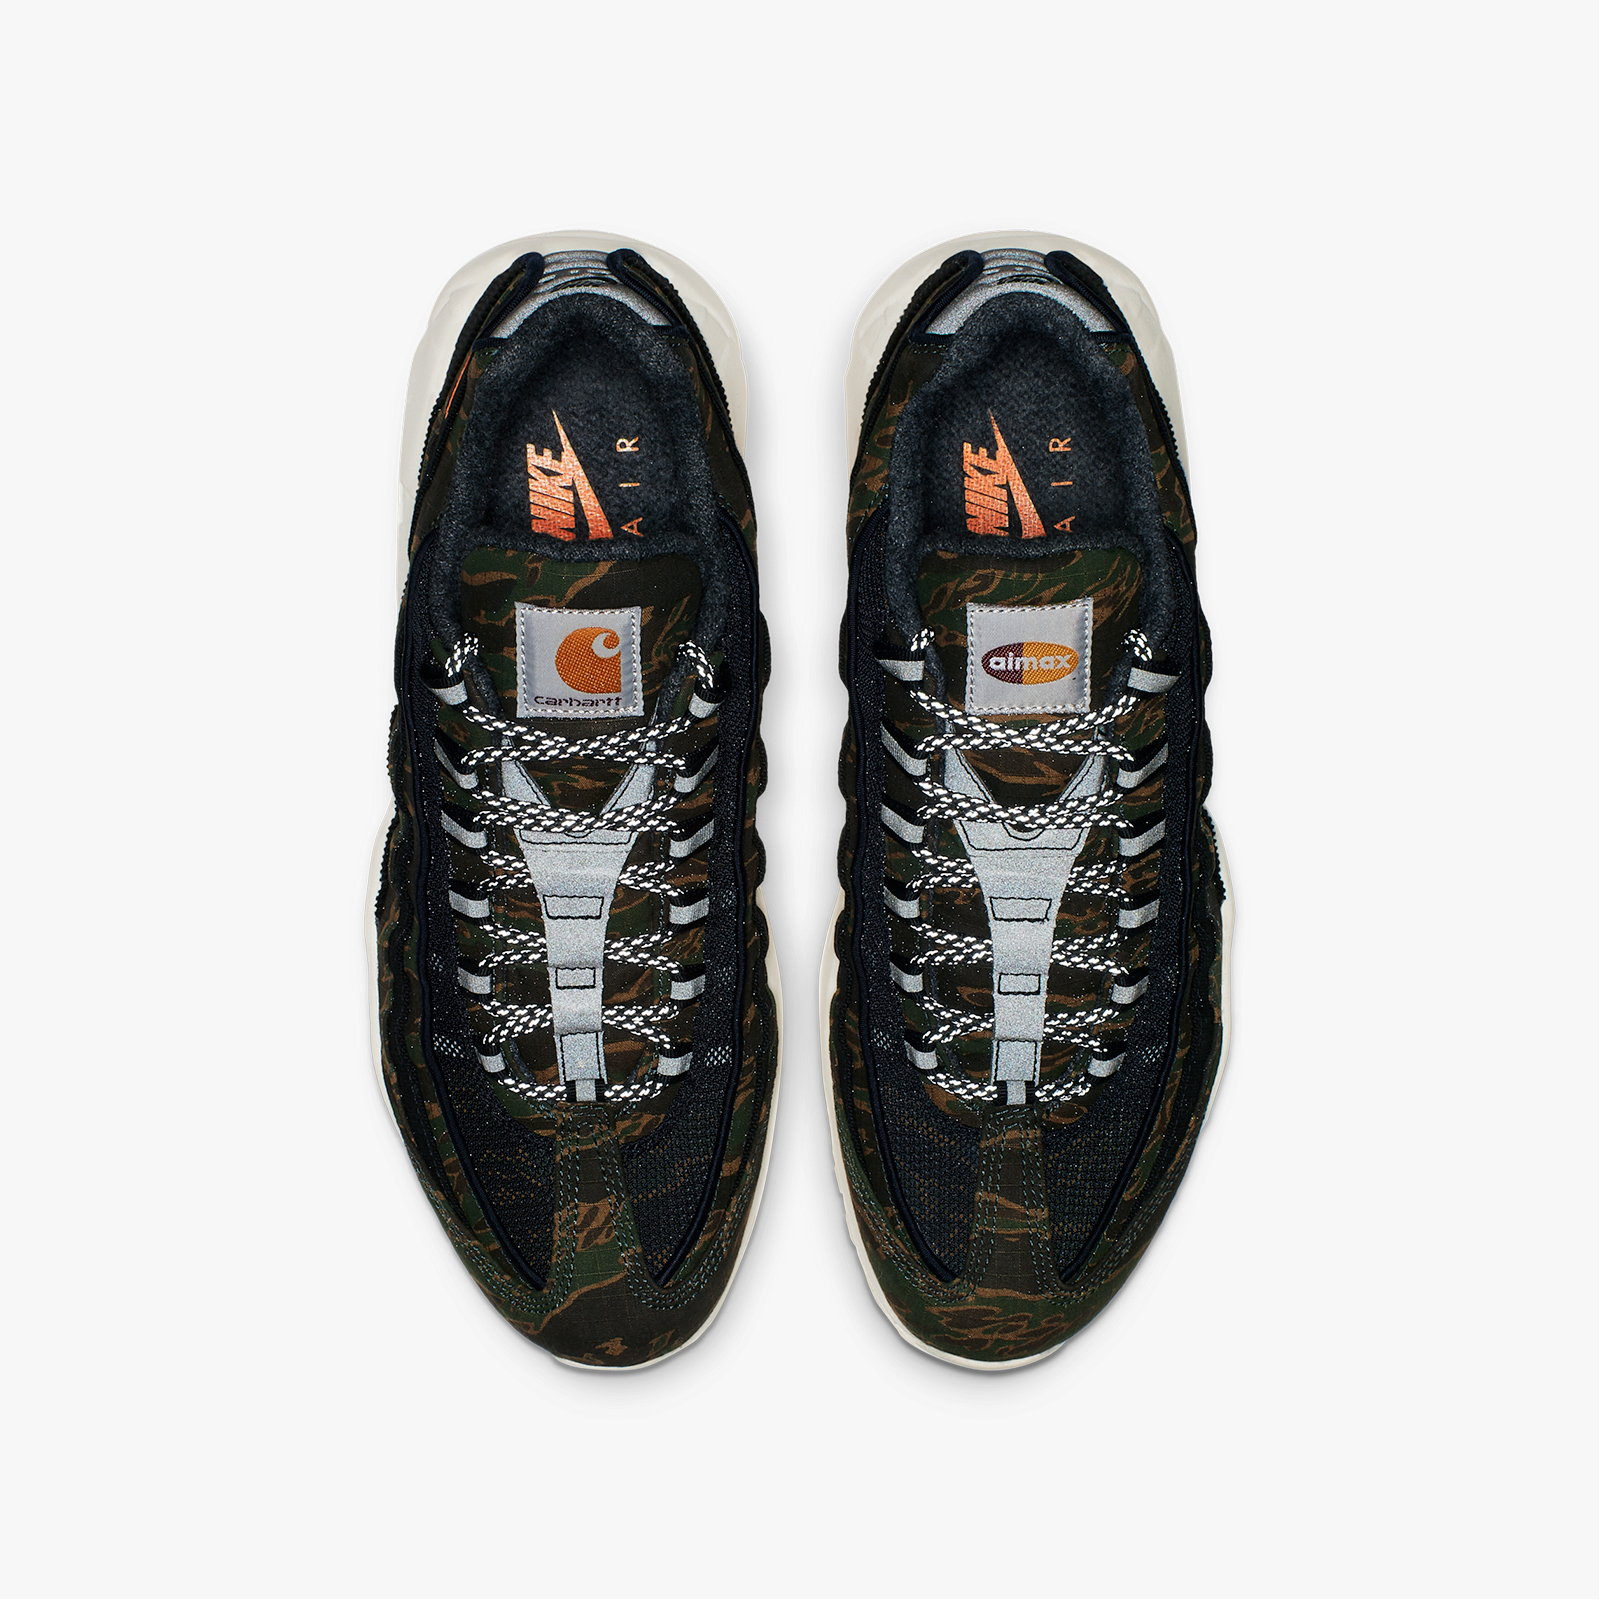 Nike Air Max 95 x Carhartt WIP Av3866 001 Sneakersnstuff